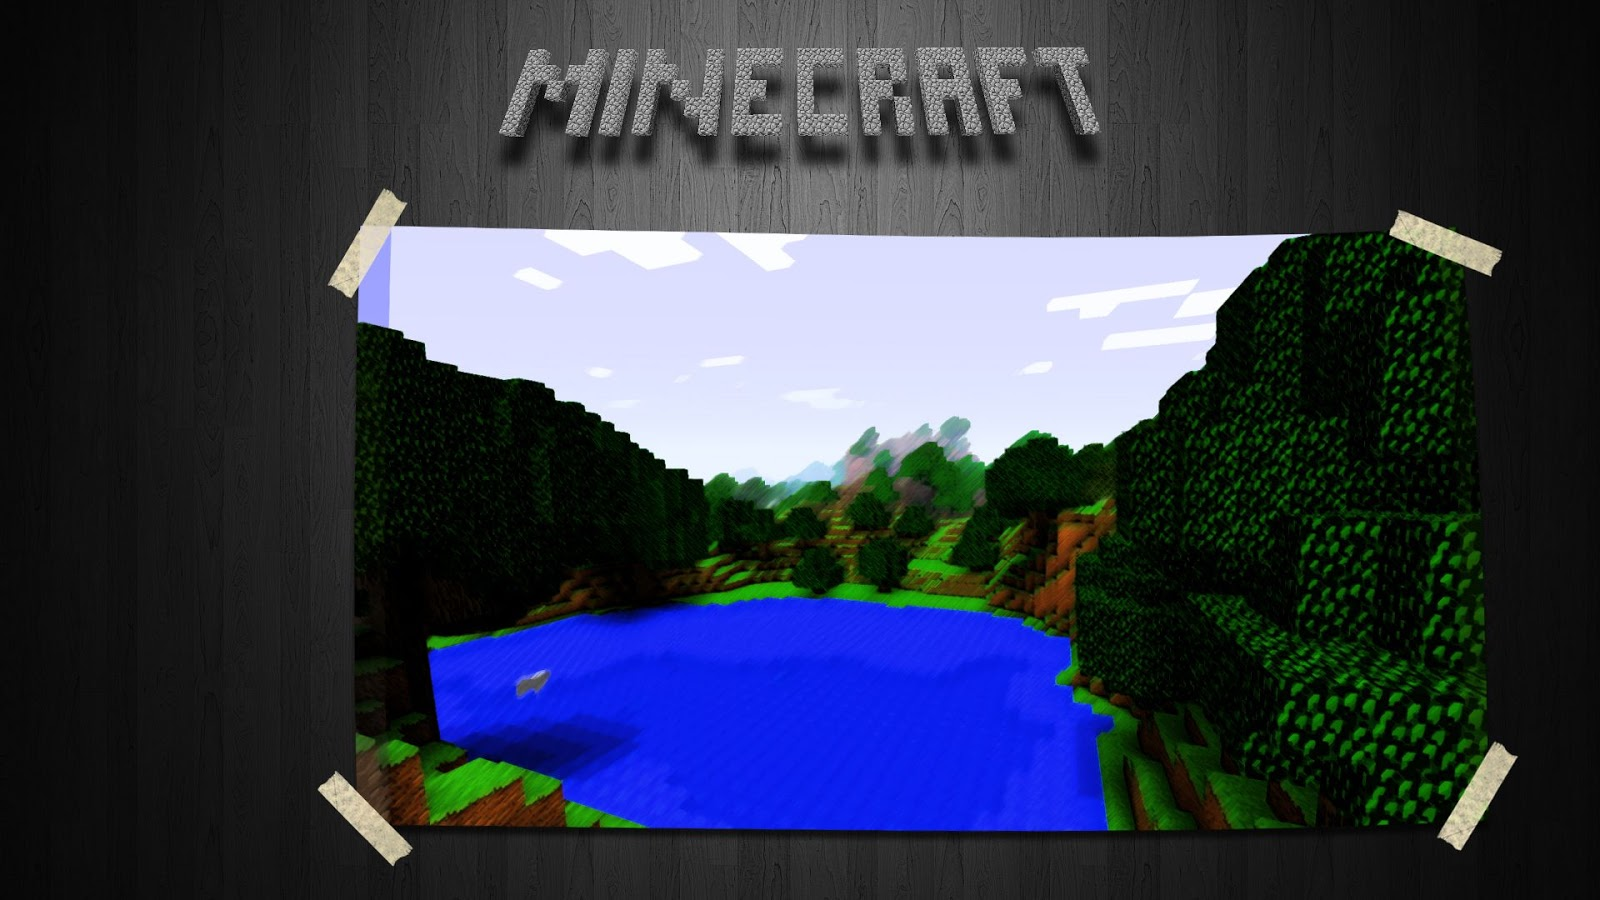 most recent minecraft hd 1080p hd wallpaper backgrounds